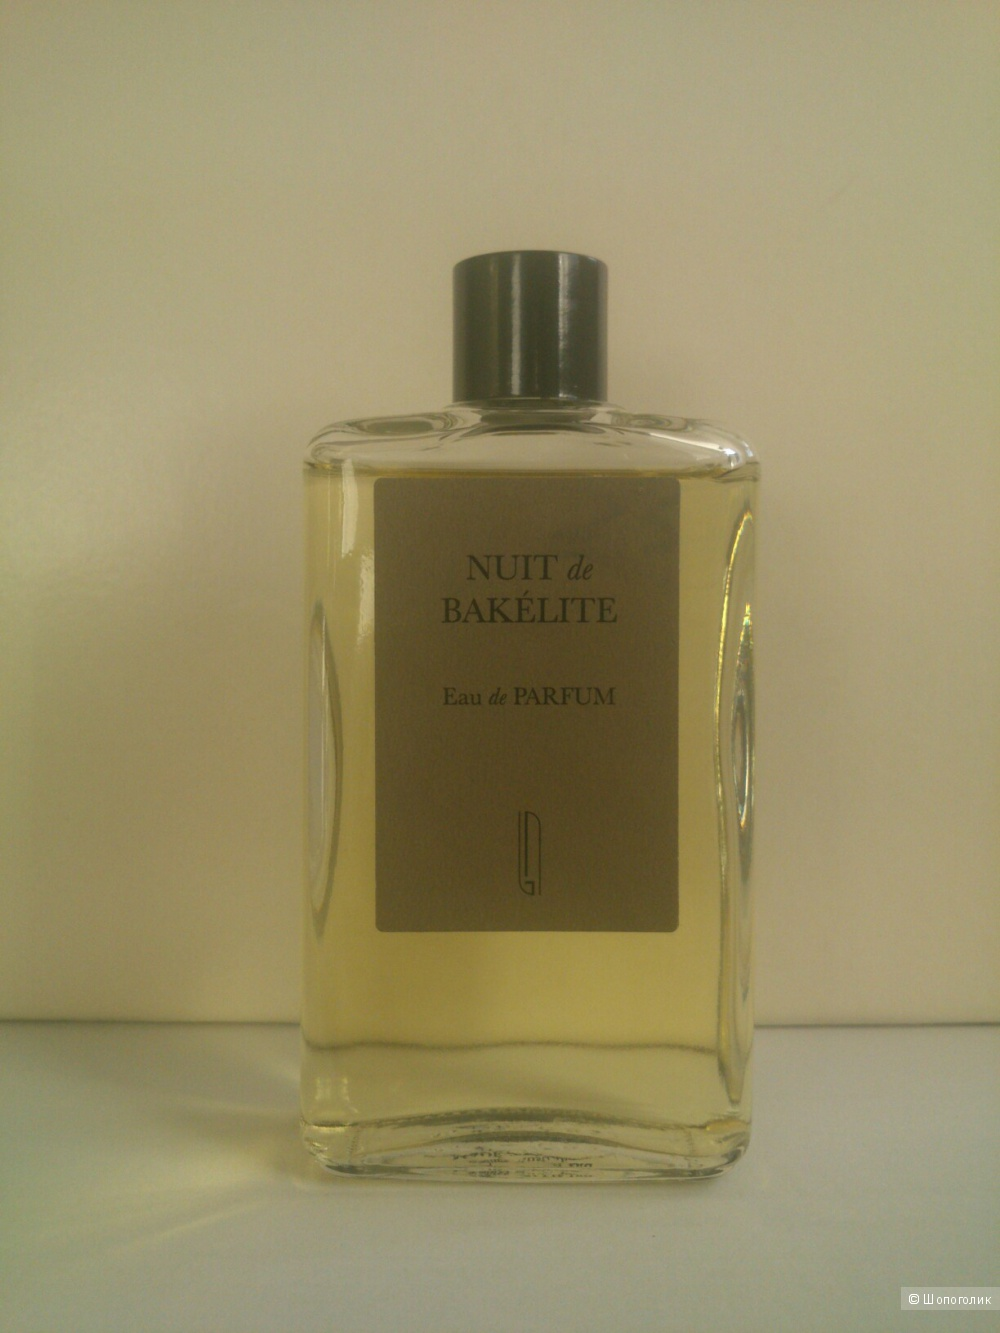 Naomi Goodsir, Nuit de Bakélite (EDP), 49/50 ml.